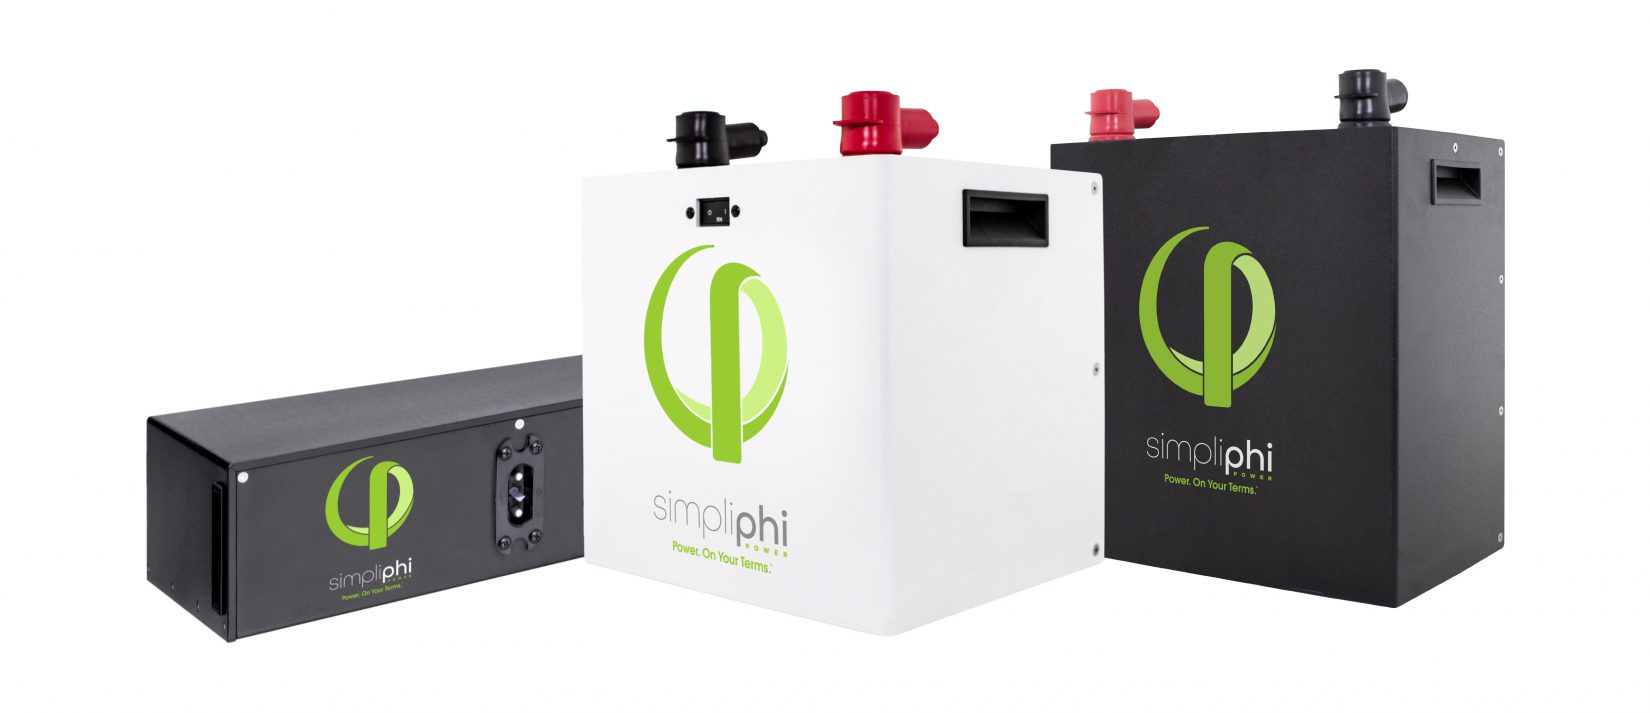 Simpliphi Power Batteries